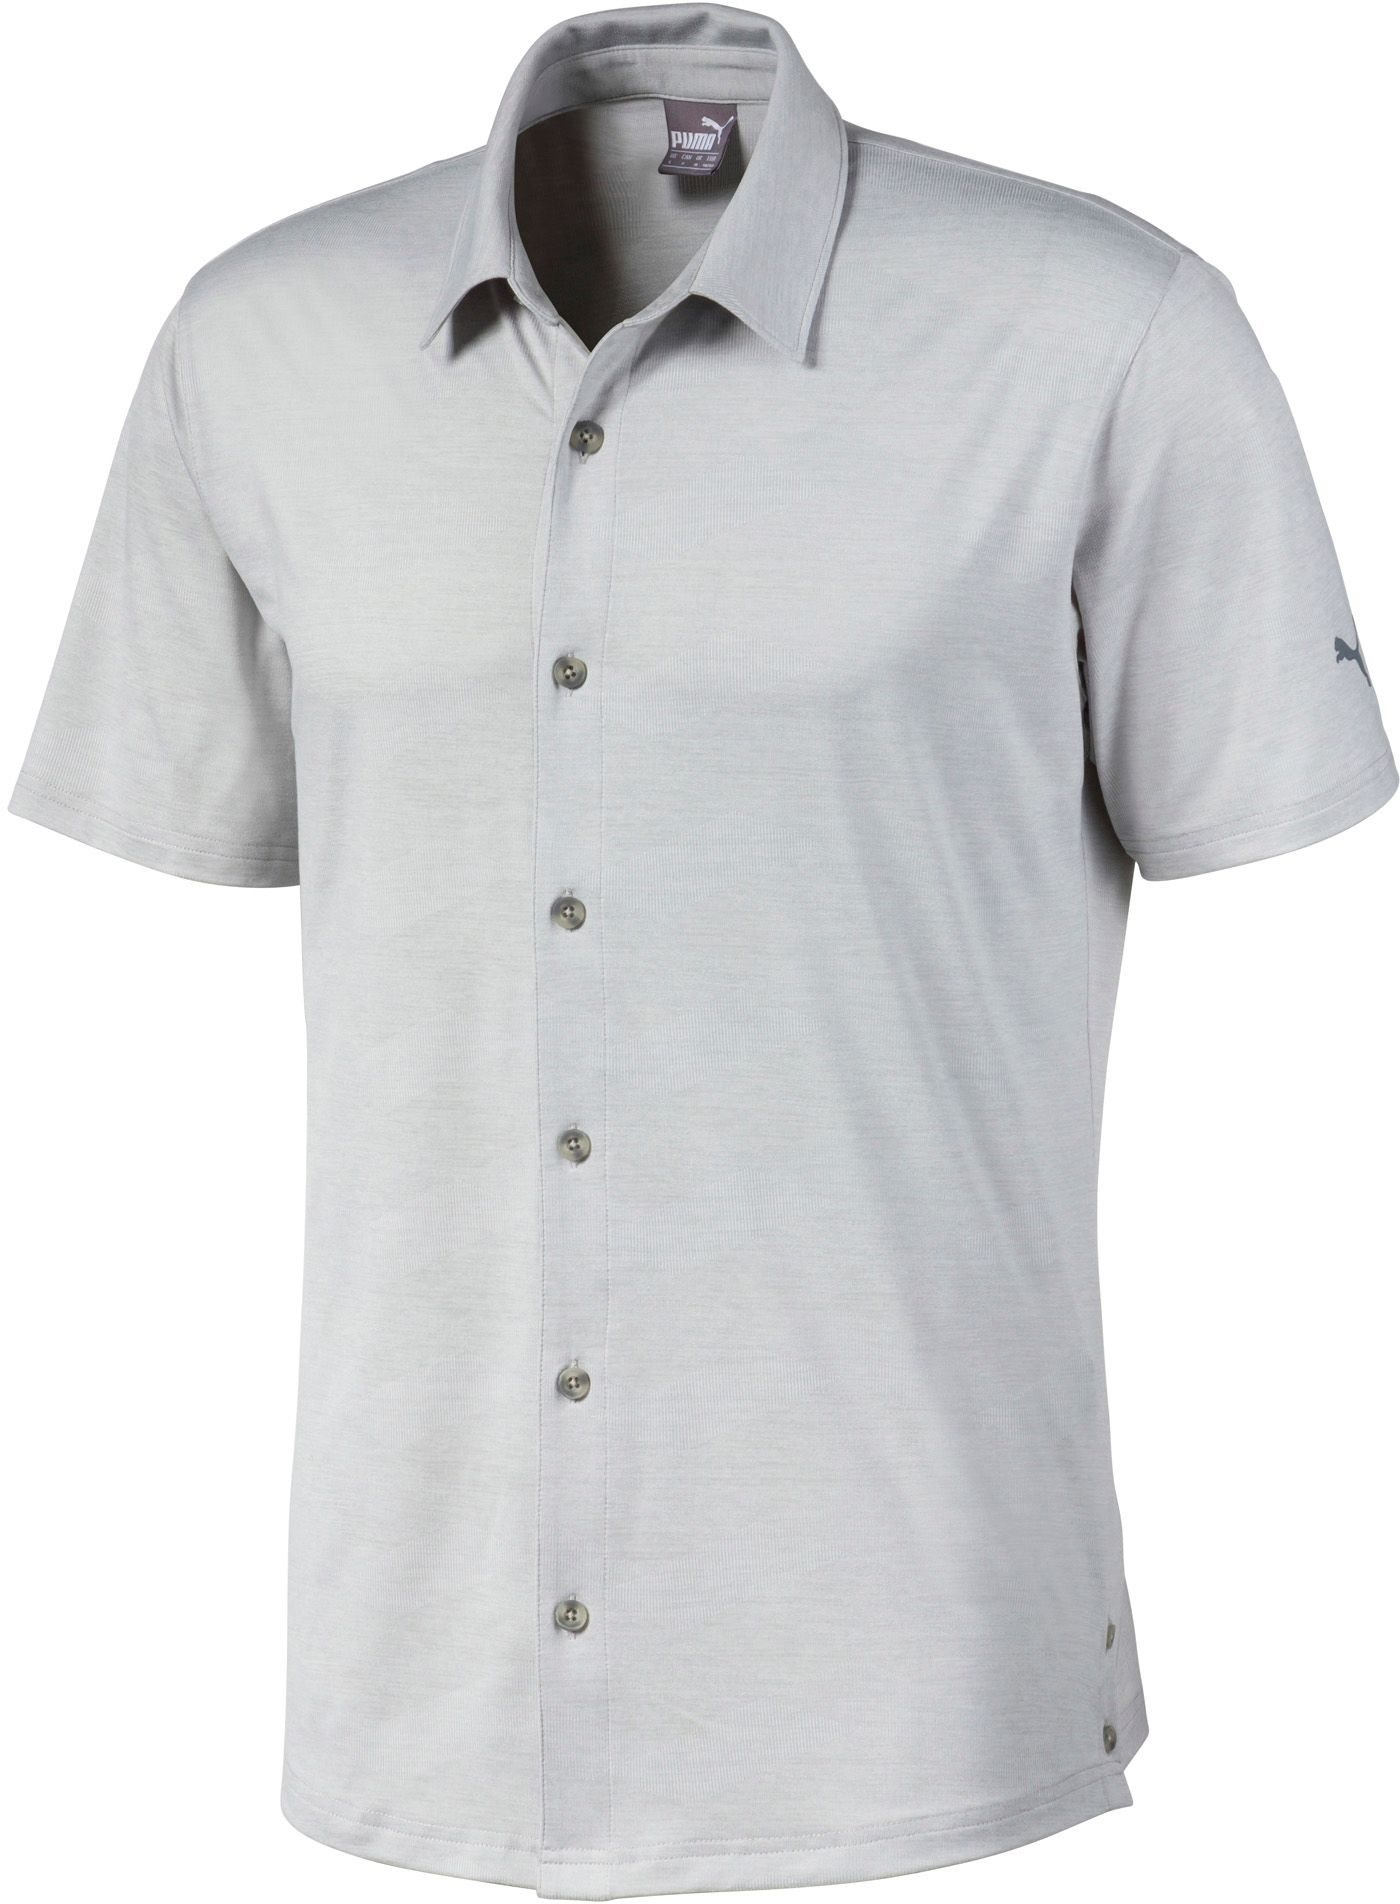 PUMA Men's Easy Living Button Down Golf Shirt